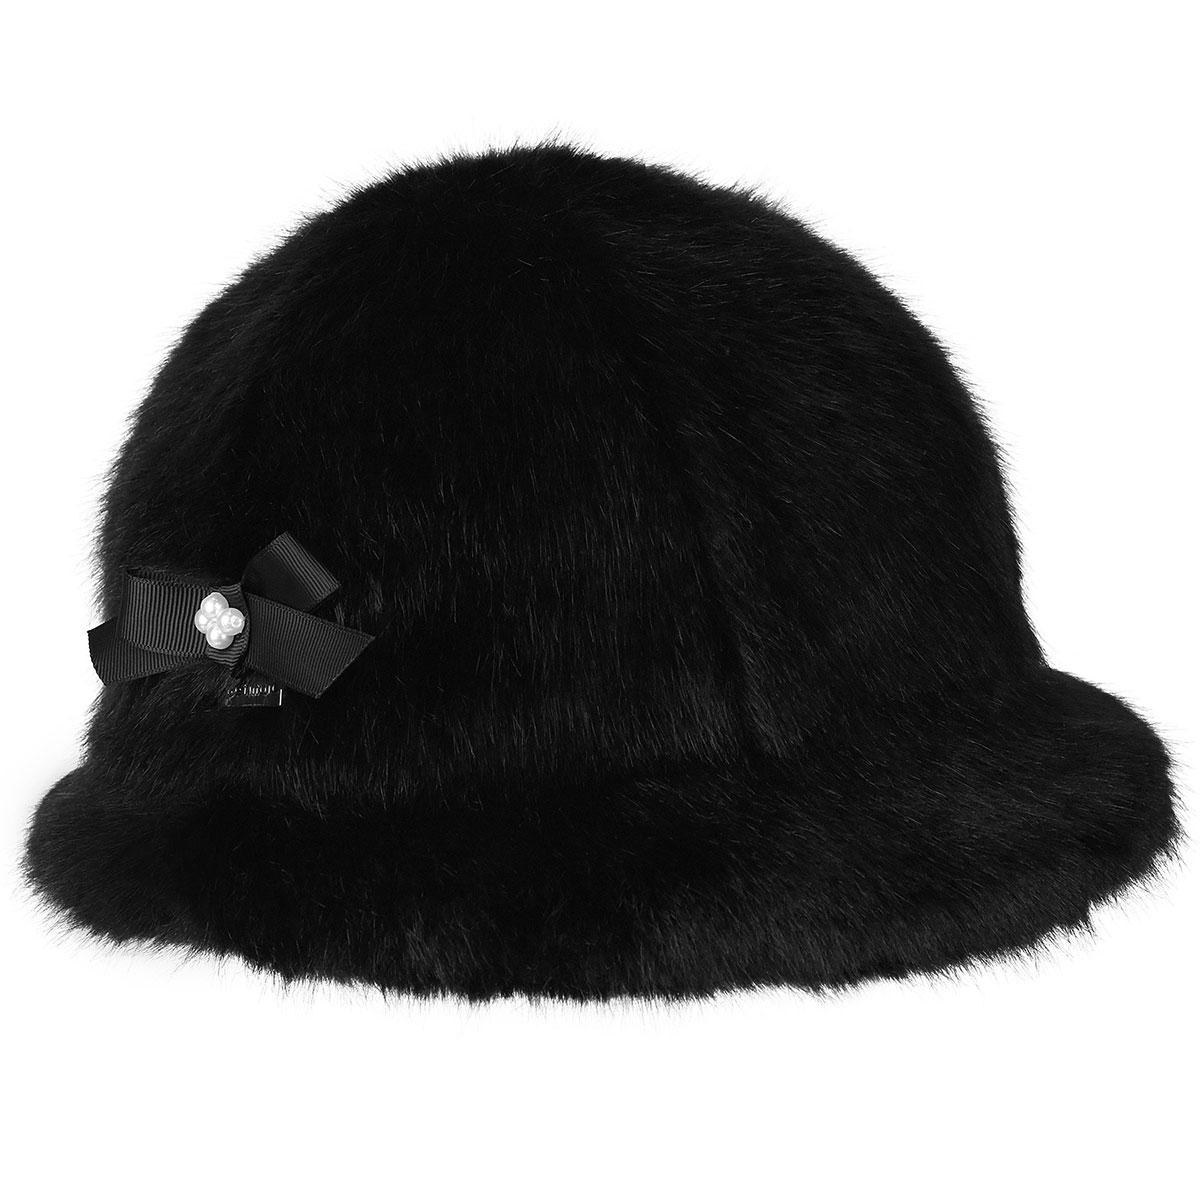 1920s Accessories | Great Gatsby Accessories Guide Suzette Faux Fur Cloche $30.80 AT vintagedancer.com